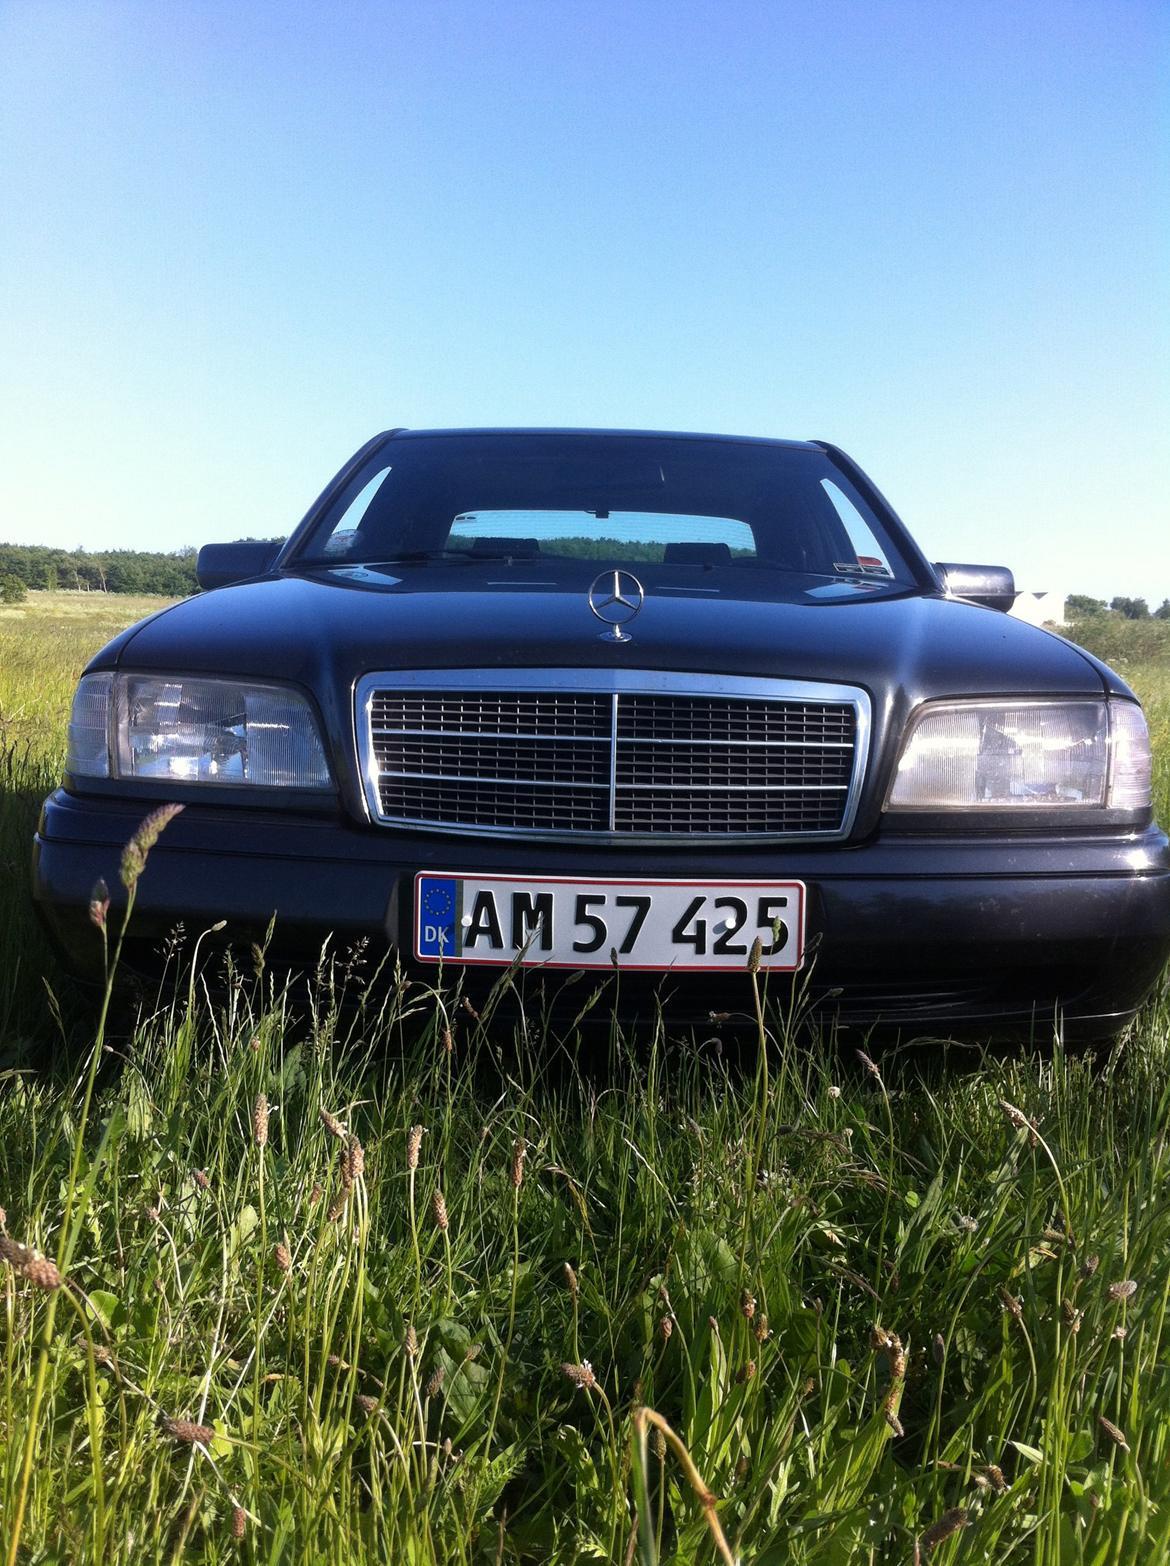 Mercedes Benz C180 billede 4